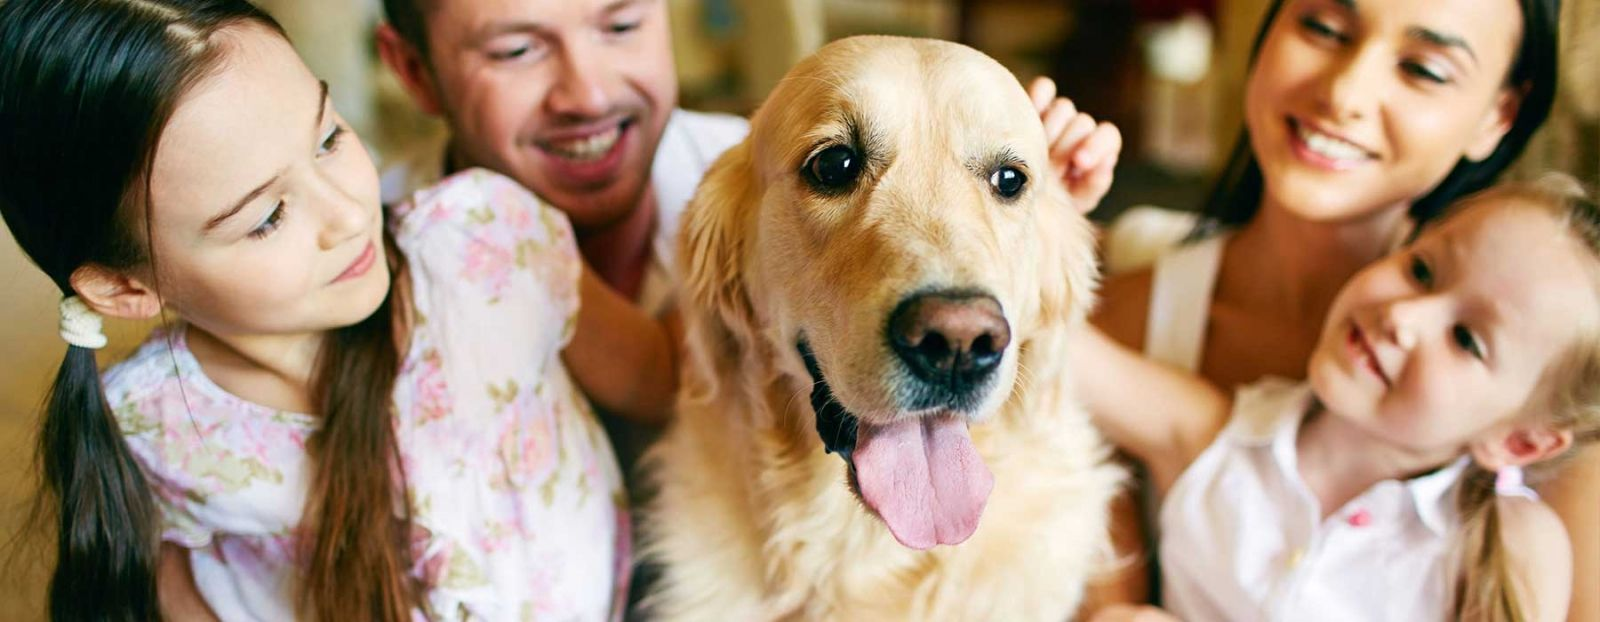 Dog cuddles.jpg